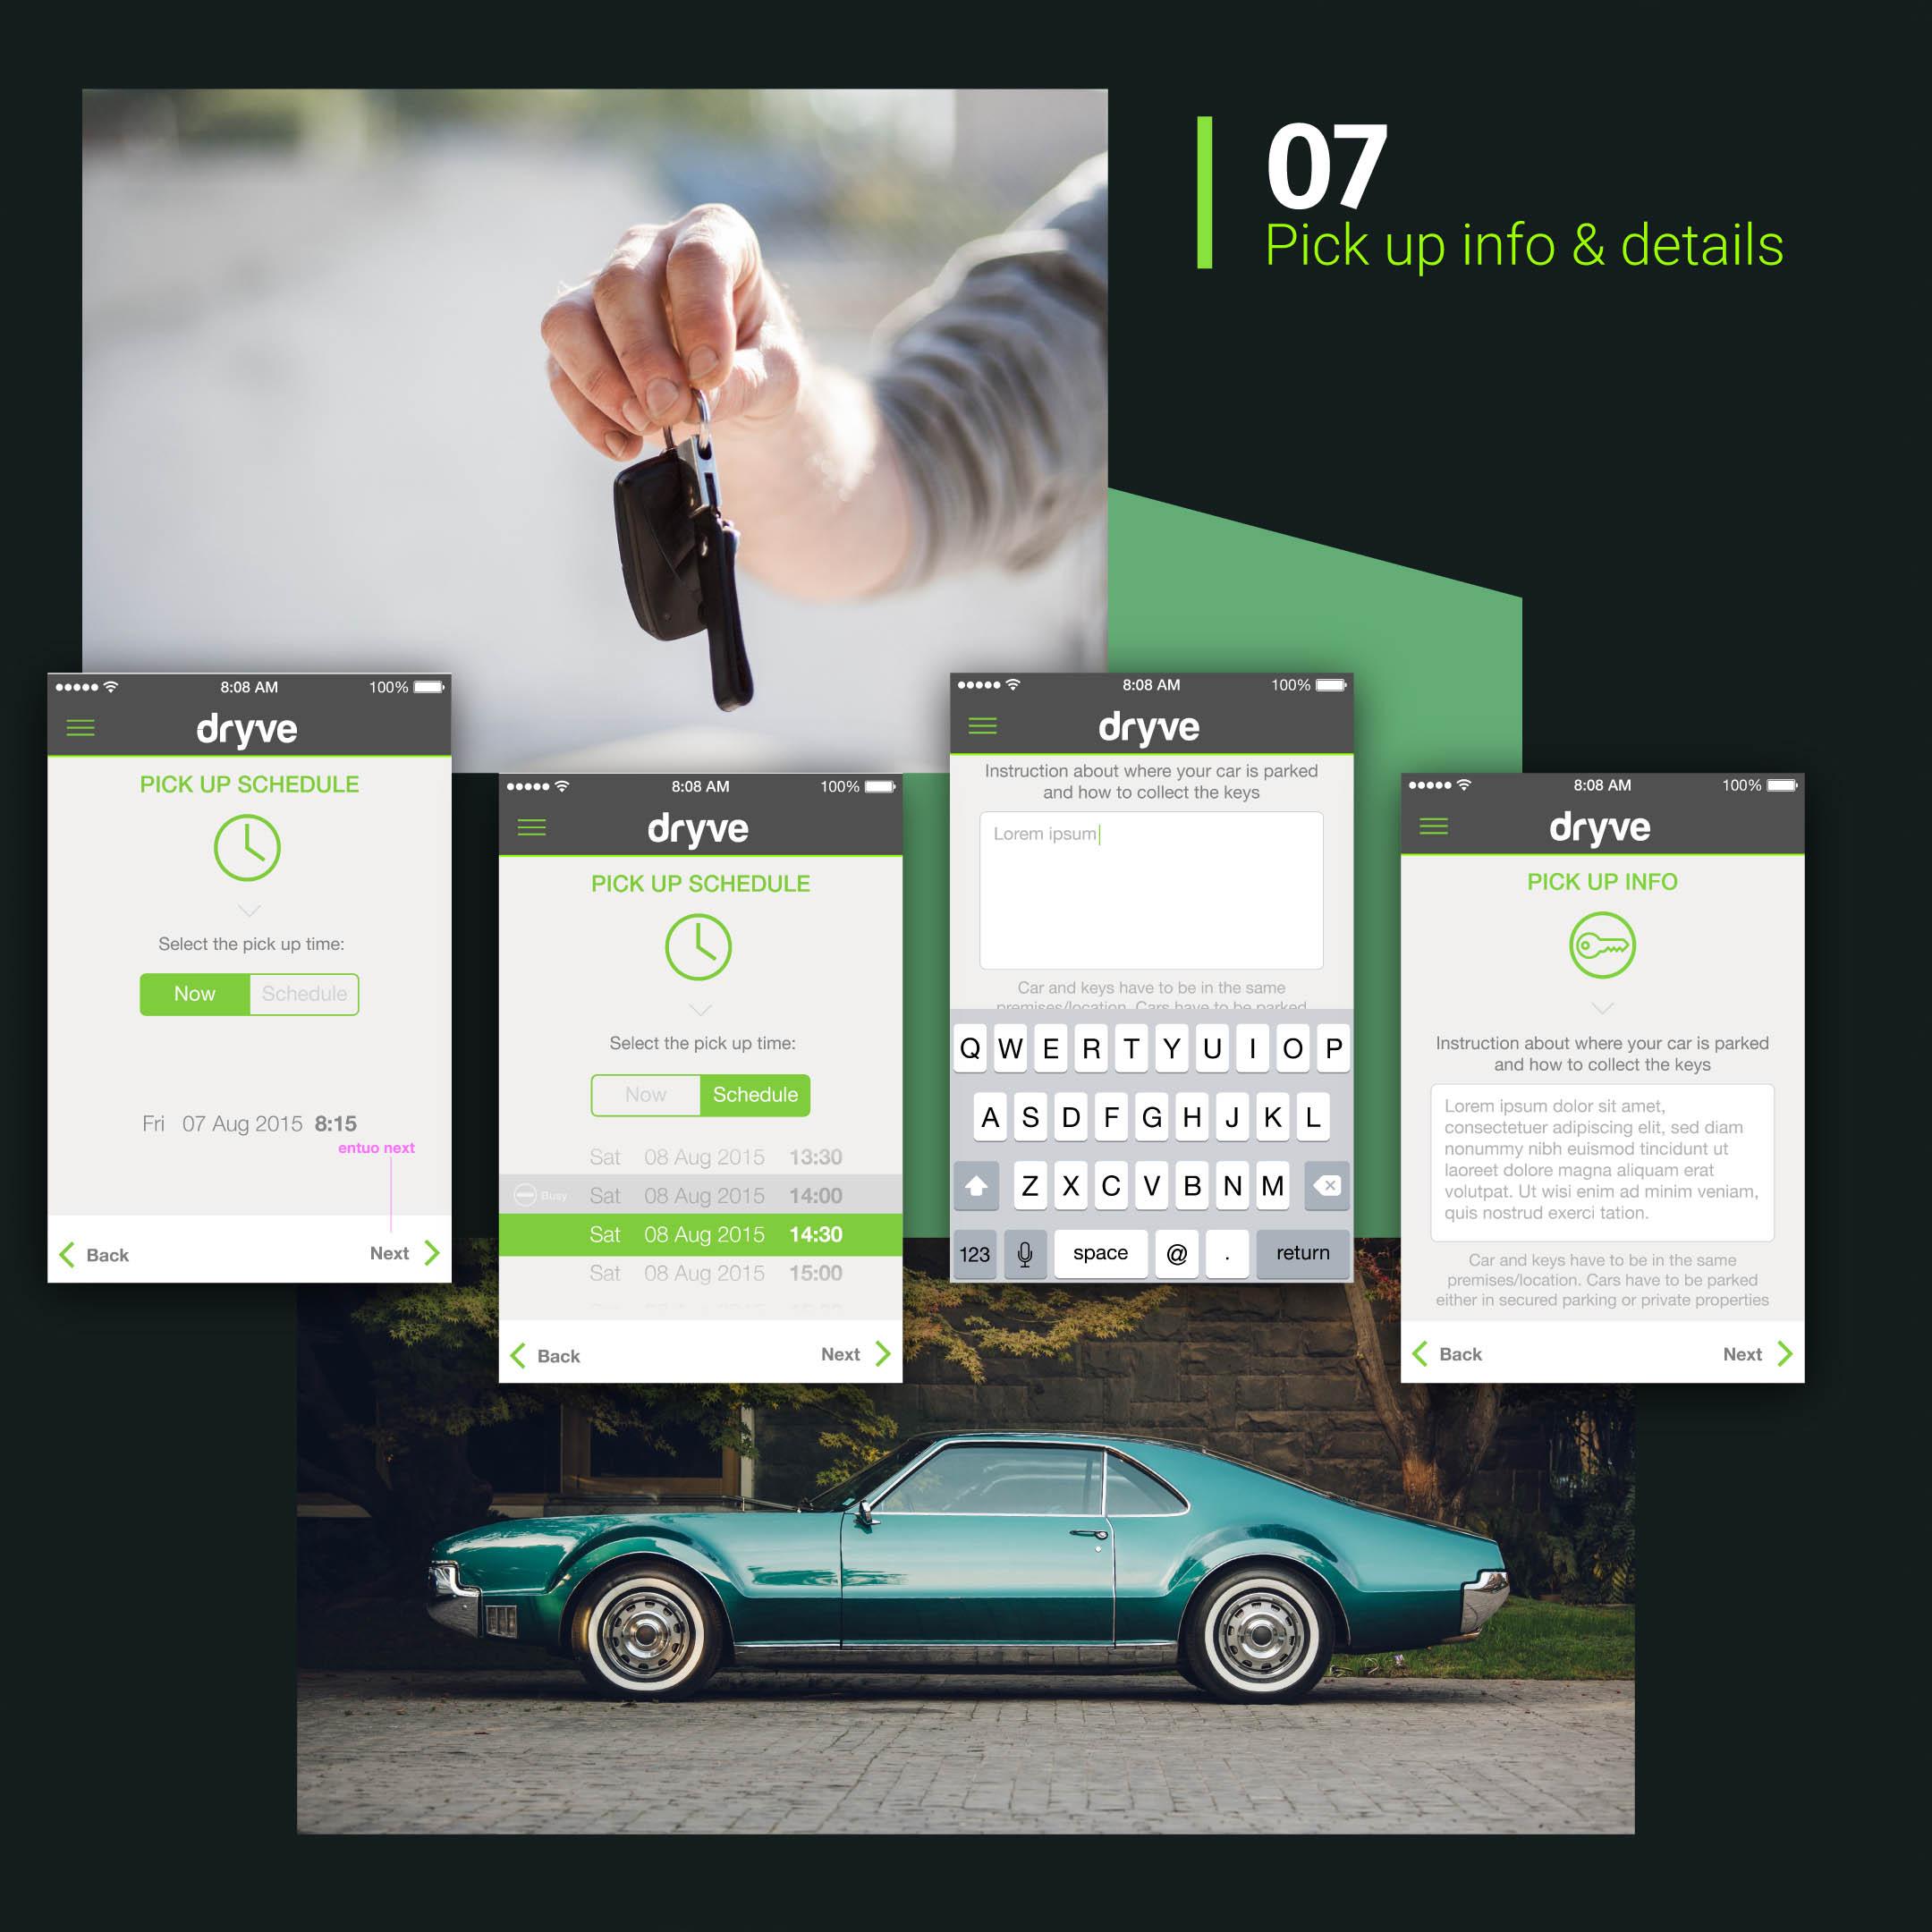 Dryve app Mockup BE Comunicazioni portfolio 07 R03